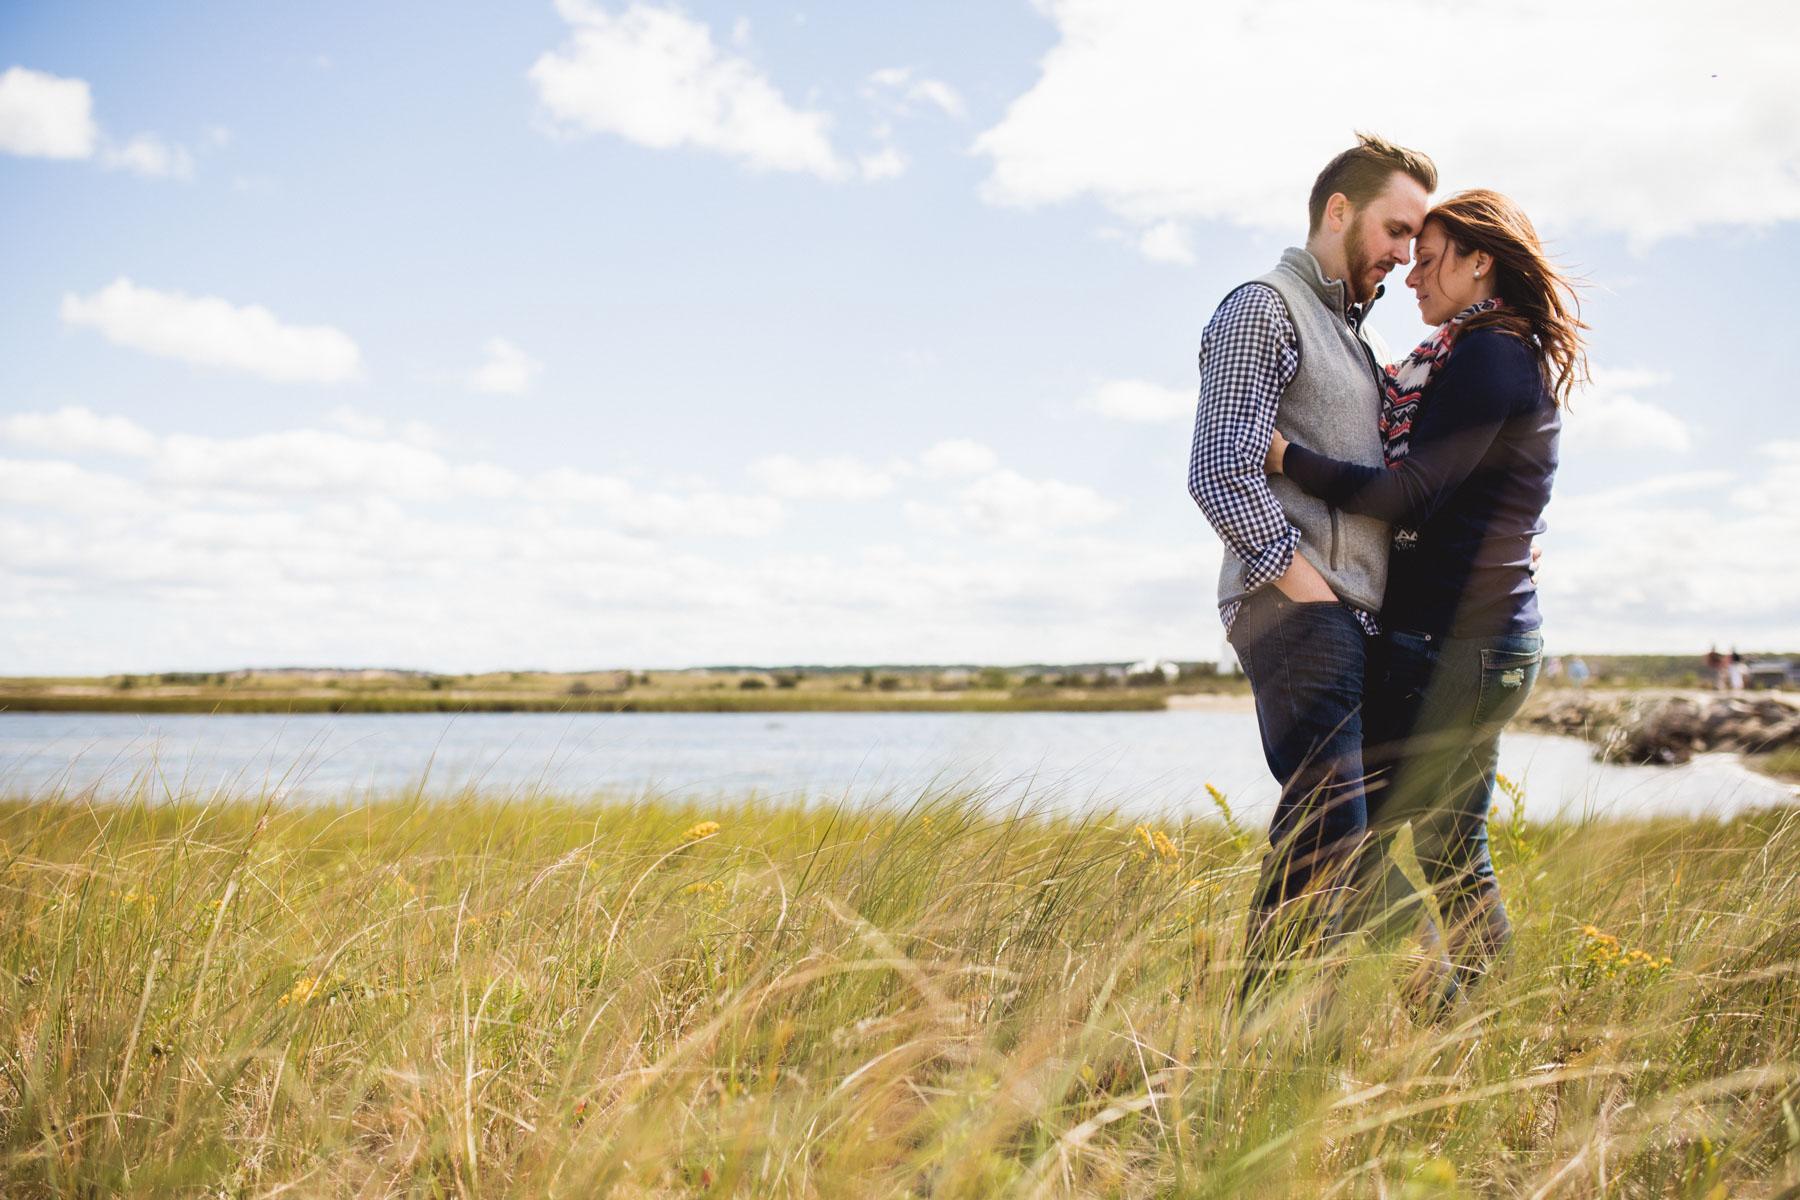 Engaged.Marthas.vineyard-11.jpg